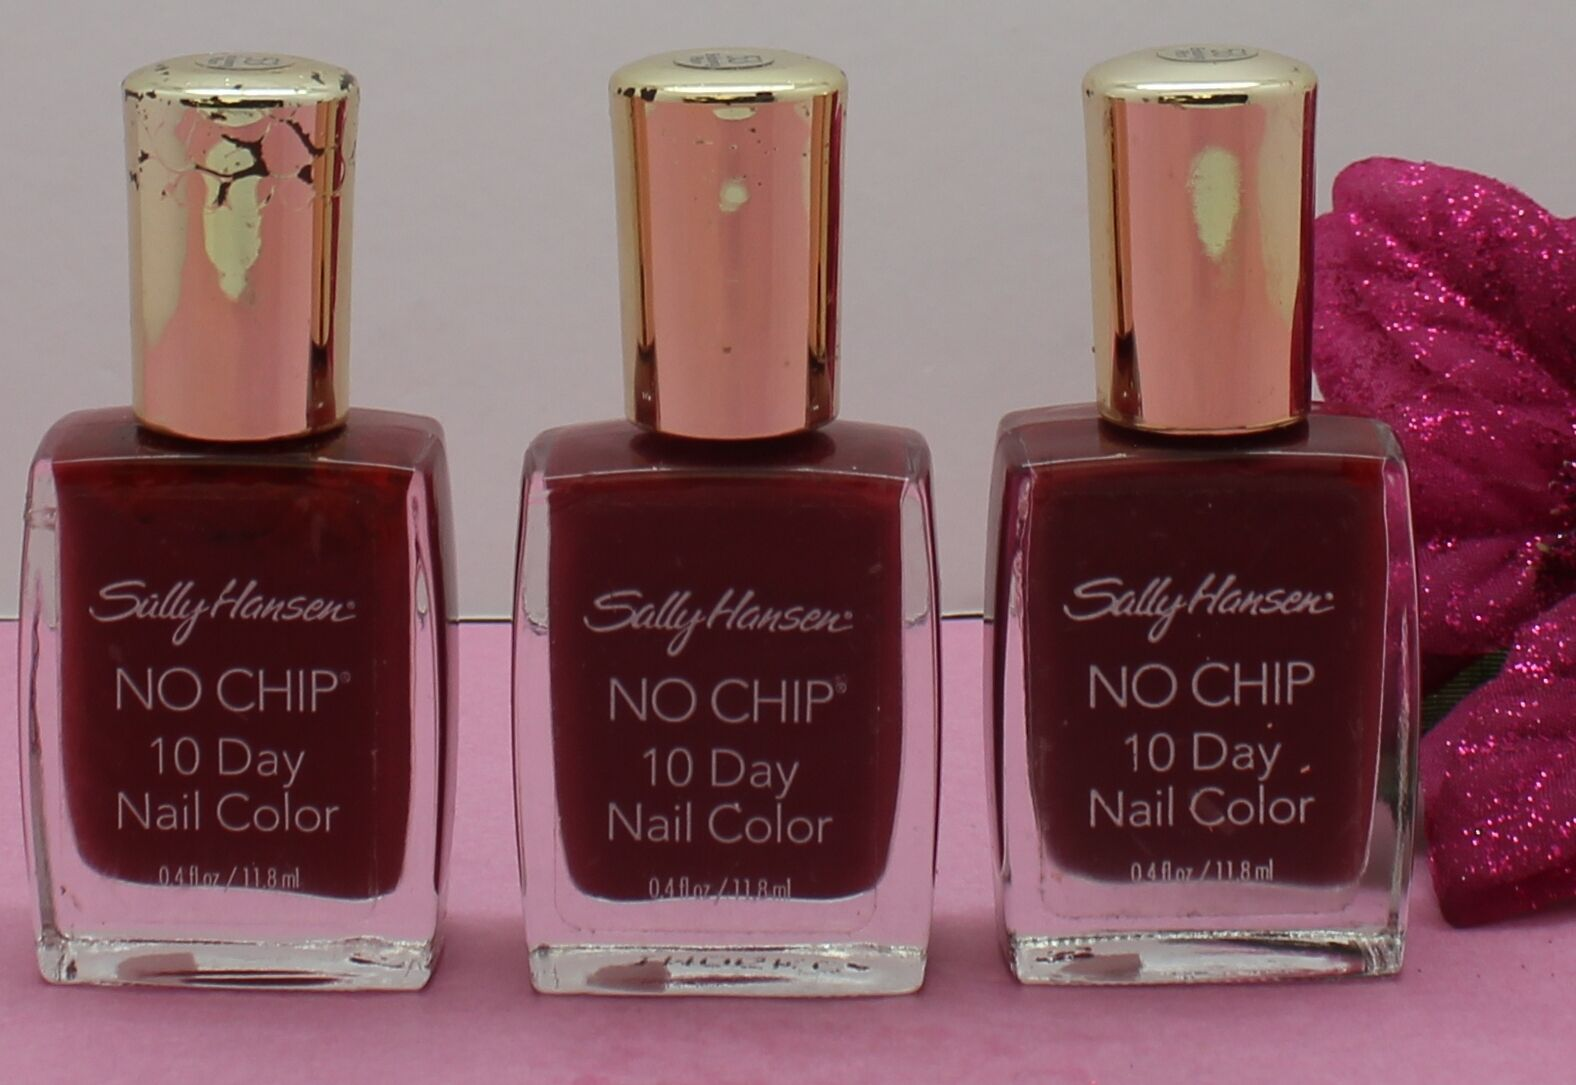 Sally Hansen No Chip 10 Day Nail Color 4840 - Enduring Plum | eBay